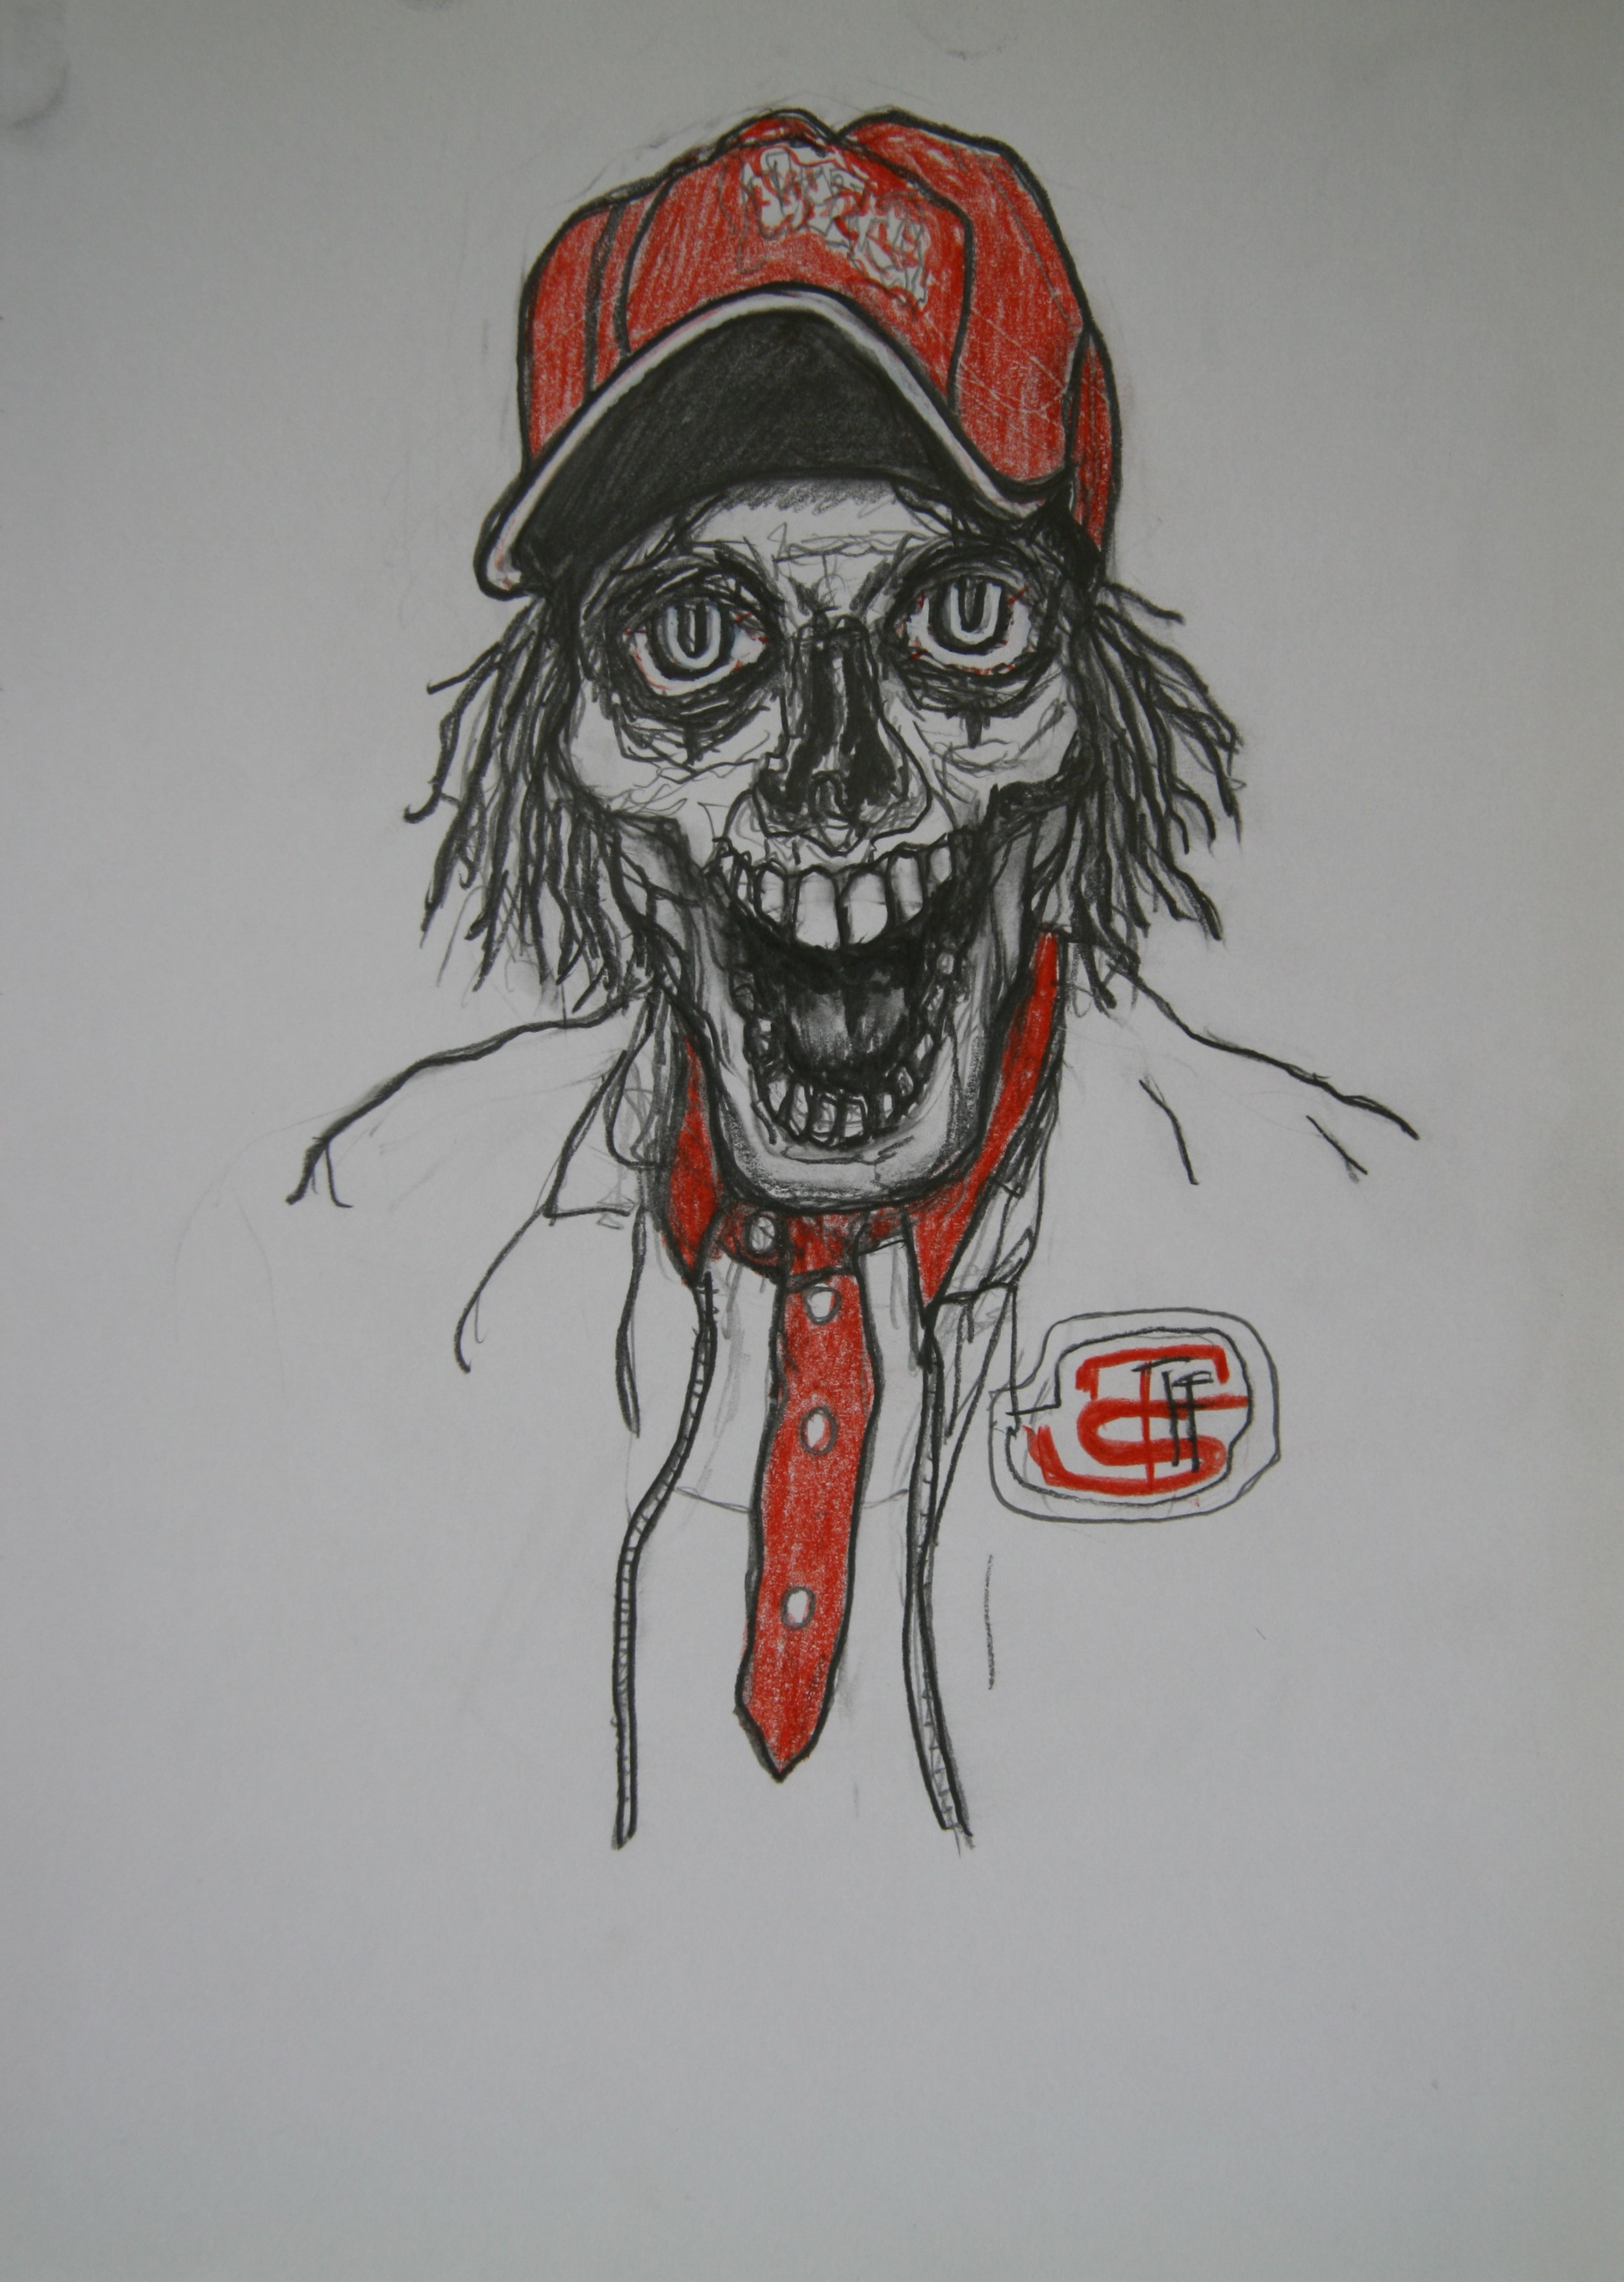 Skull 2, 30x21cm, pencil on paper